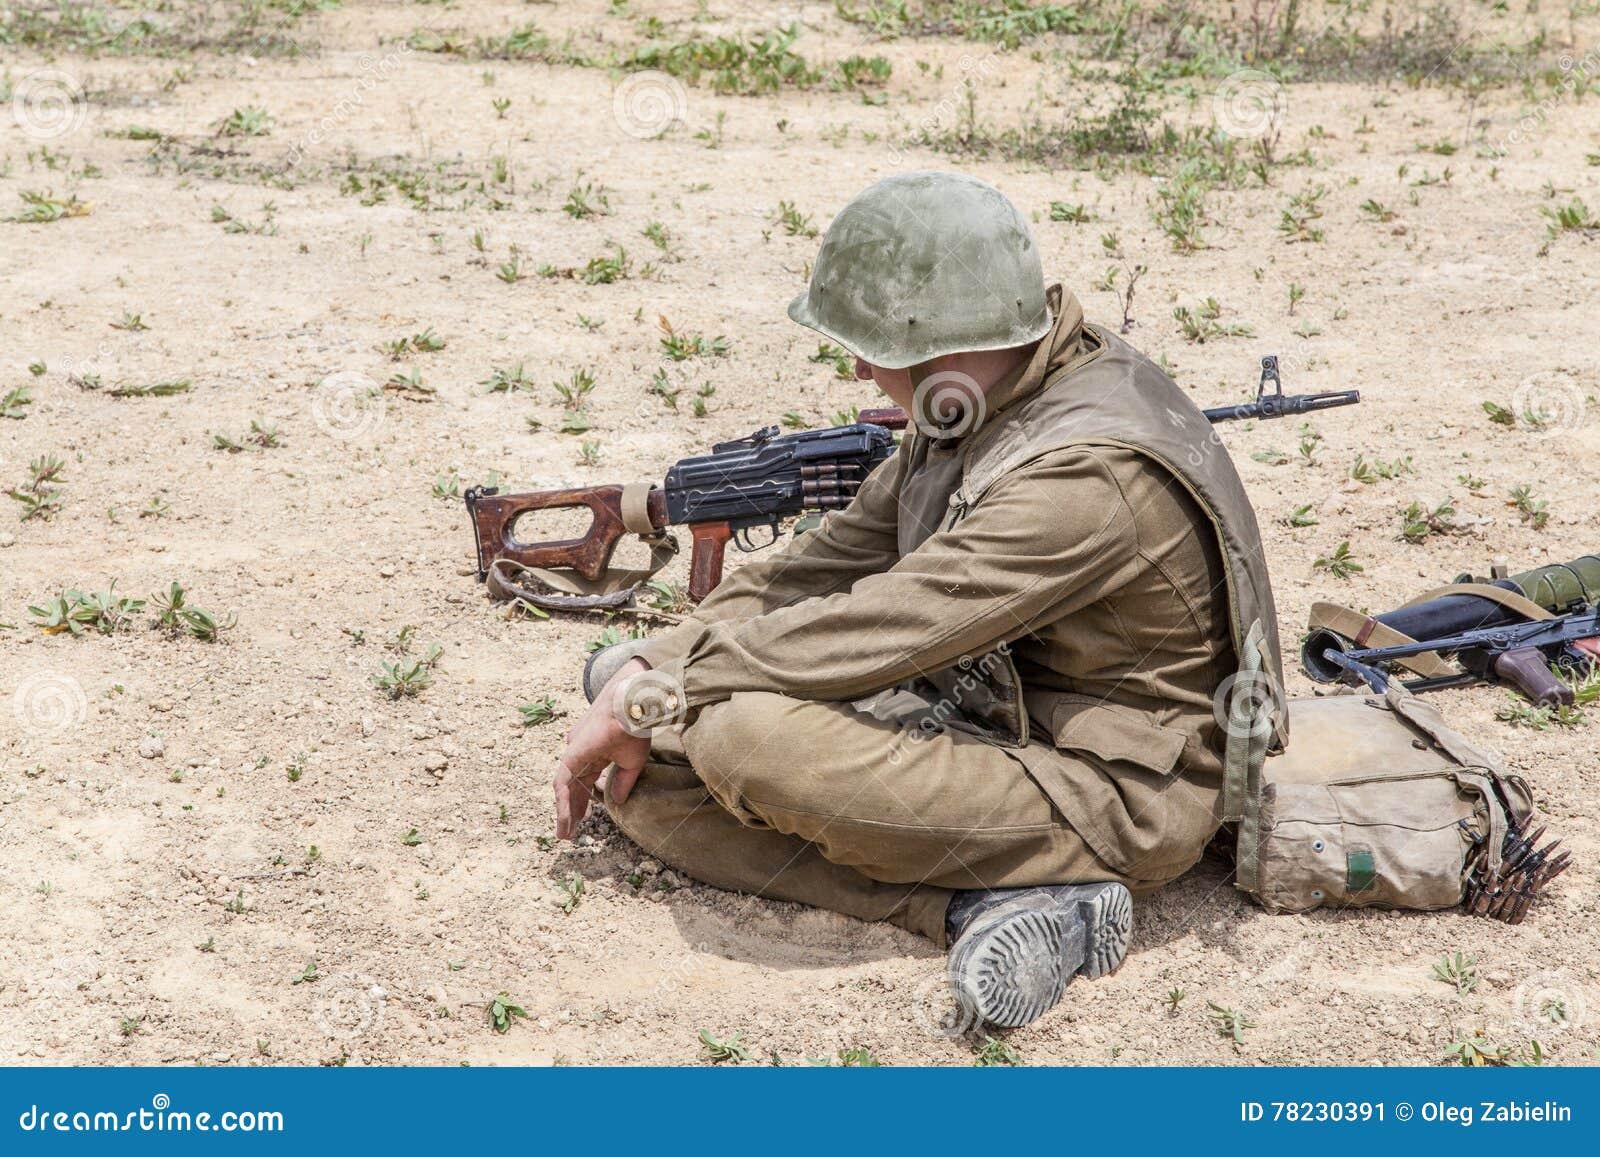 Soviet Afghanistan war - Page 6 Soviet-paratrooper-afghanistan-afghan-war-78230391